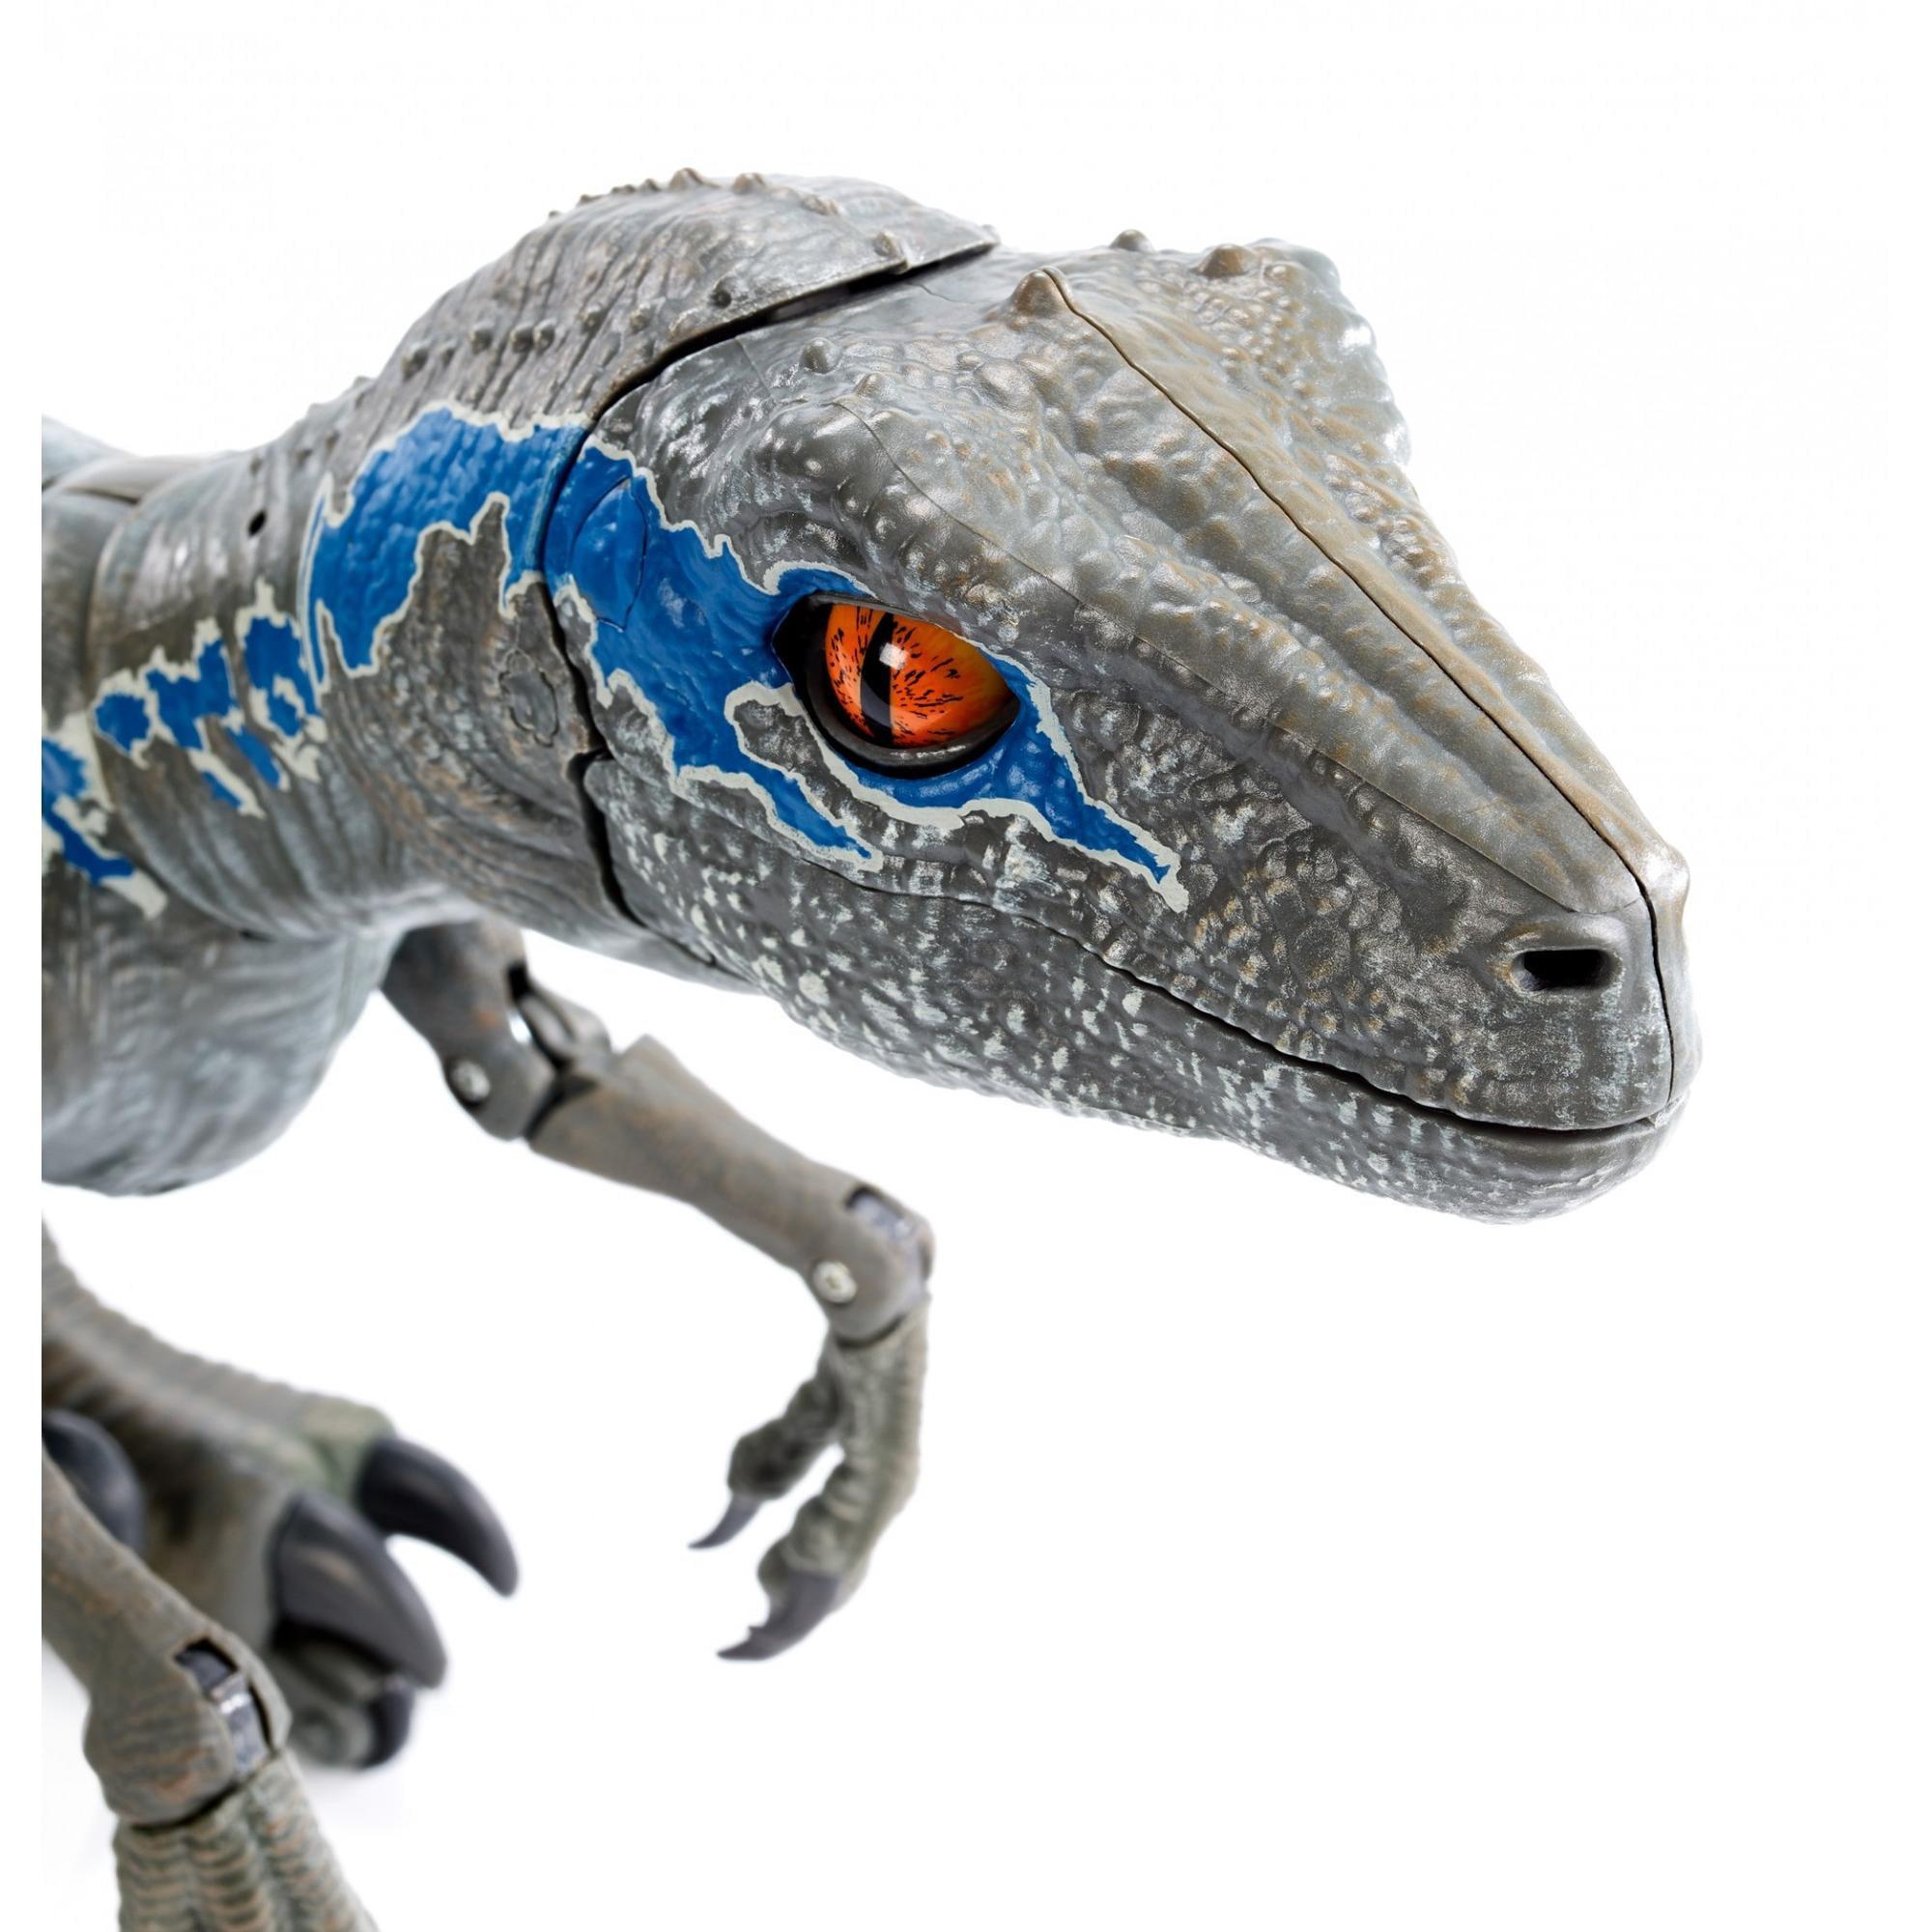 2018 Jurassic World Alpha Training Blue Hottest Velociraptor dinosaur Toy for 8